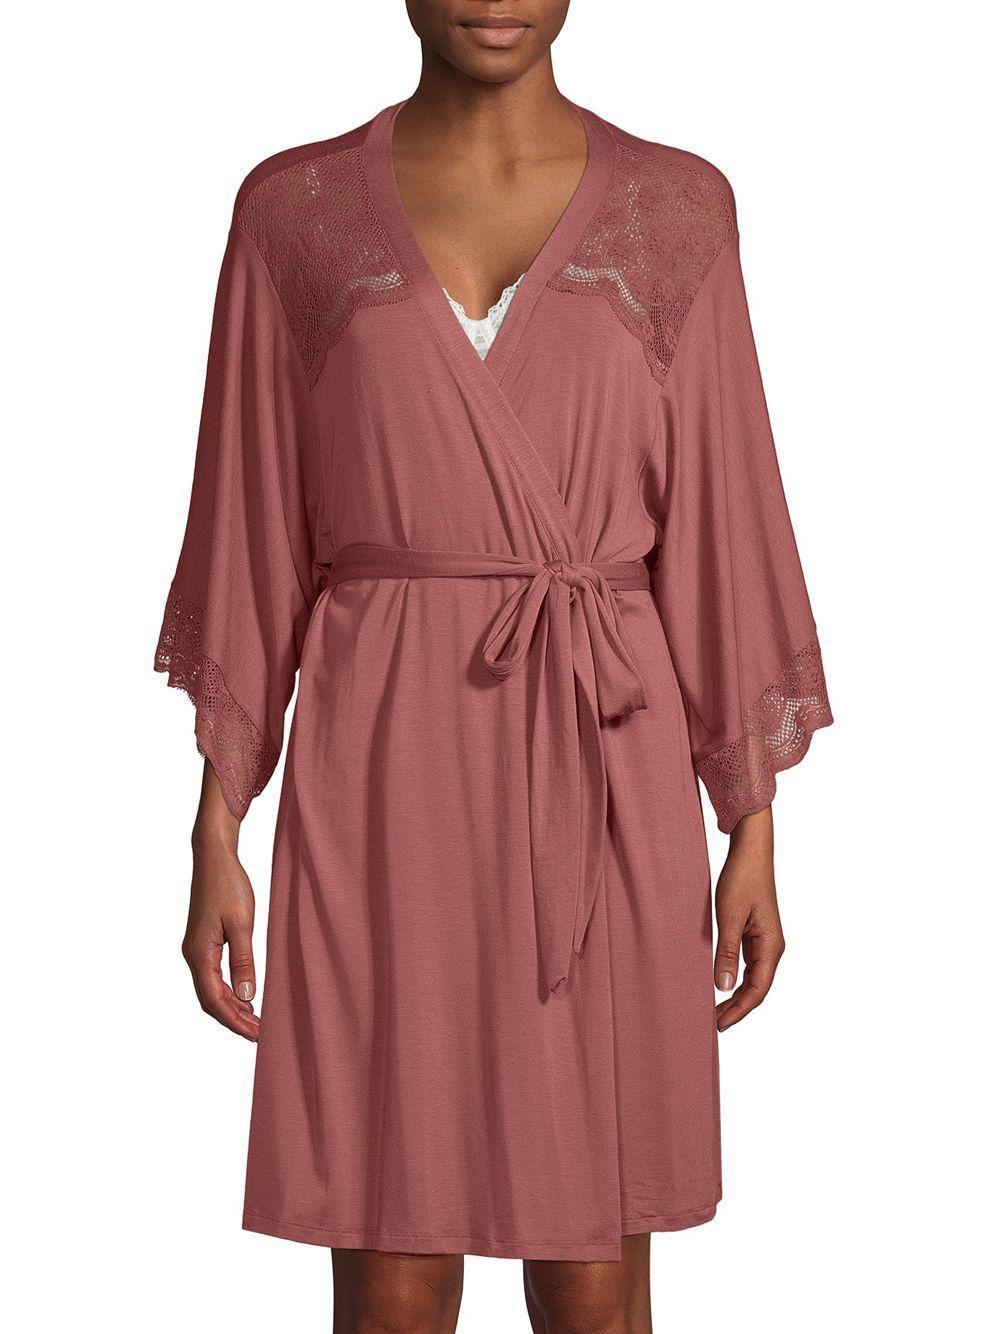 Lyst - Eberjey Petunia Lace-trimmed Kimono Robe in Red 29c4c0c59